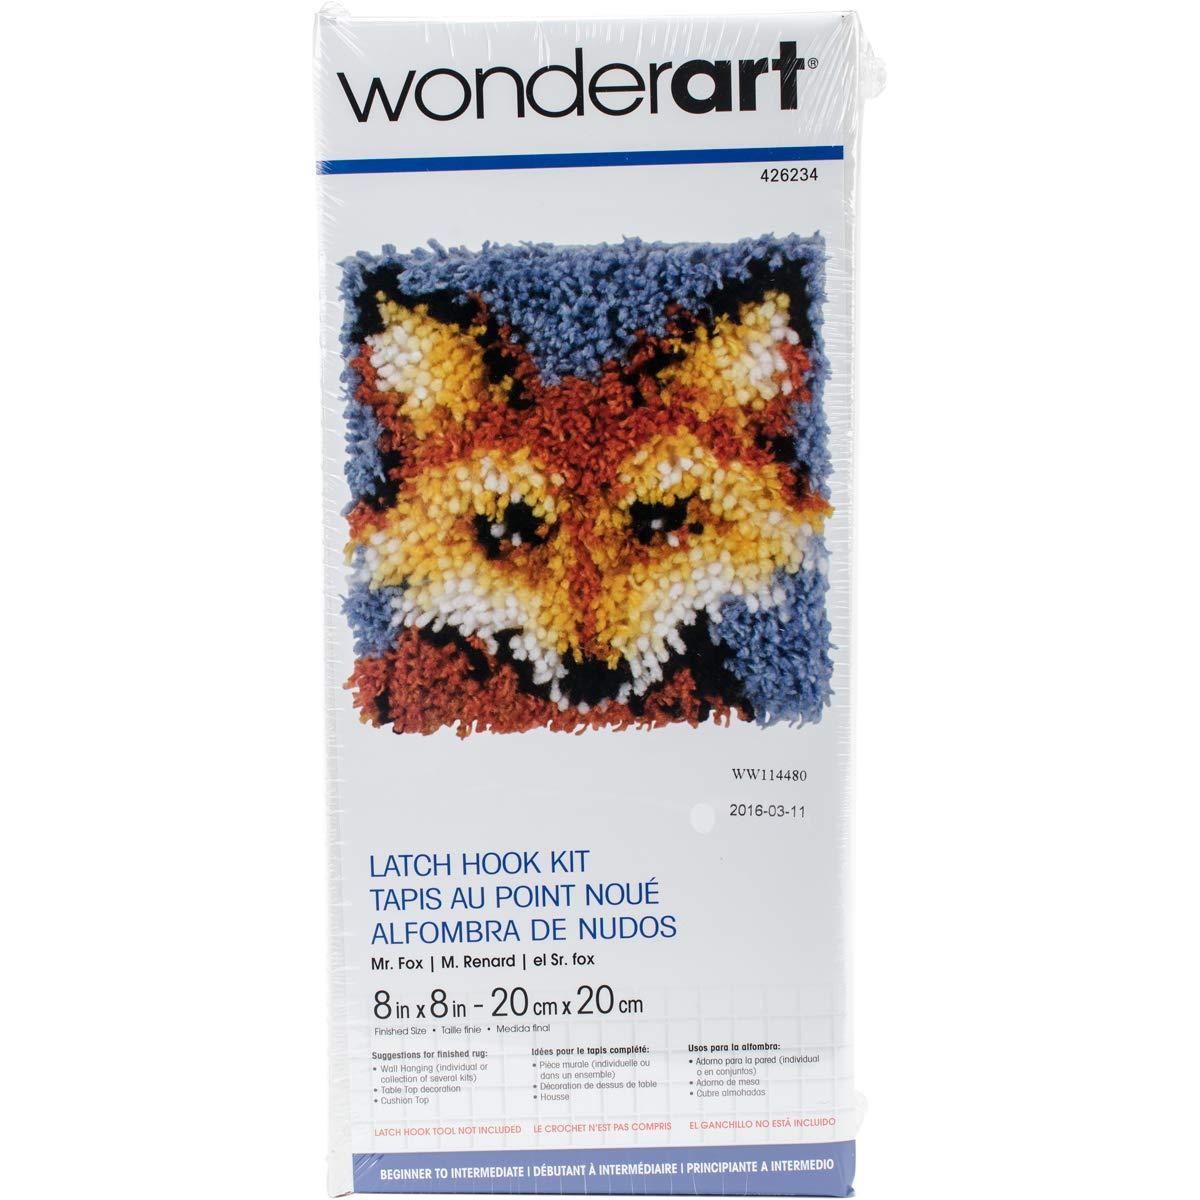 Wonderart Mr. Fox Latch Hook Kit, 8